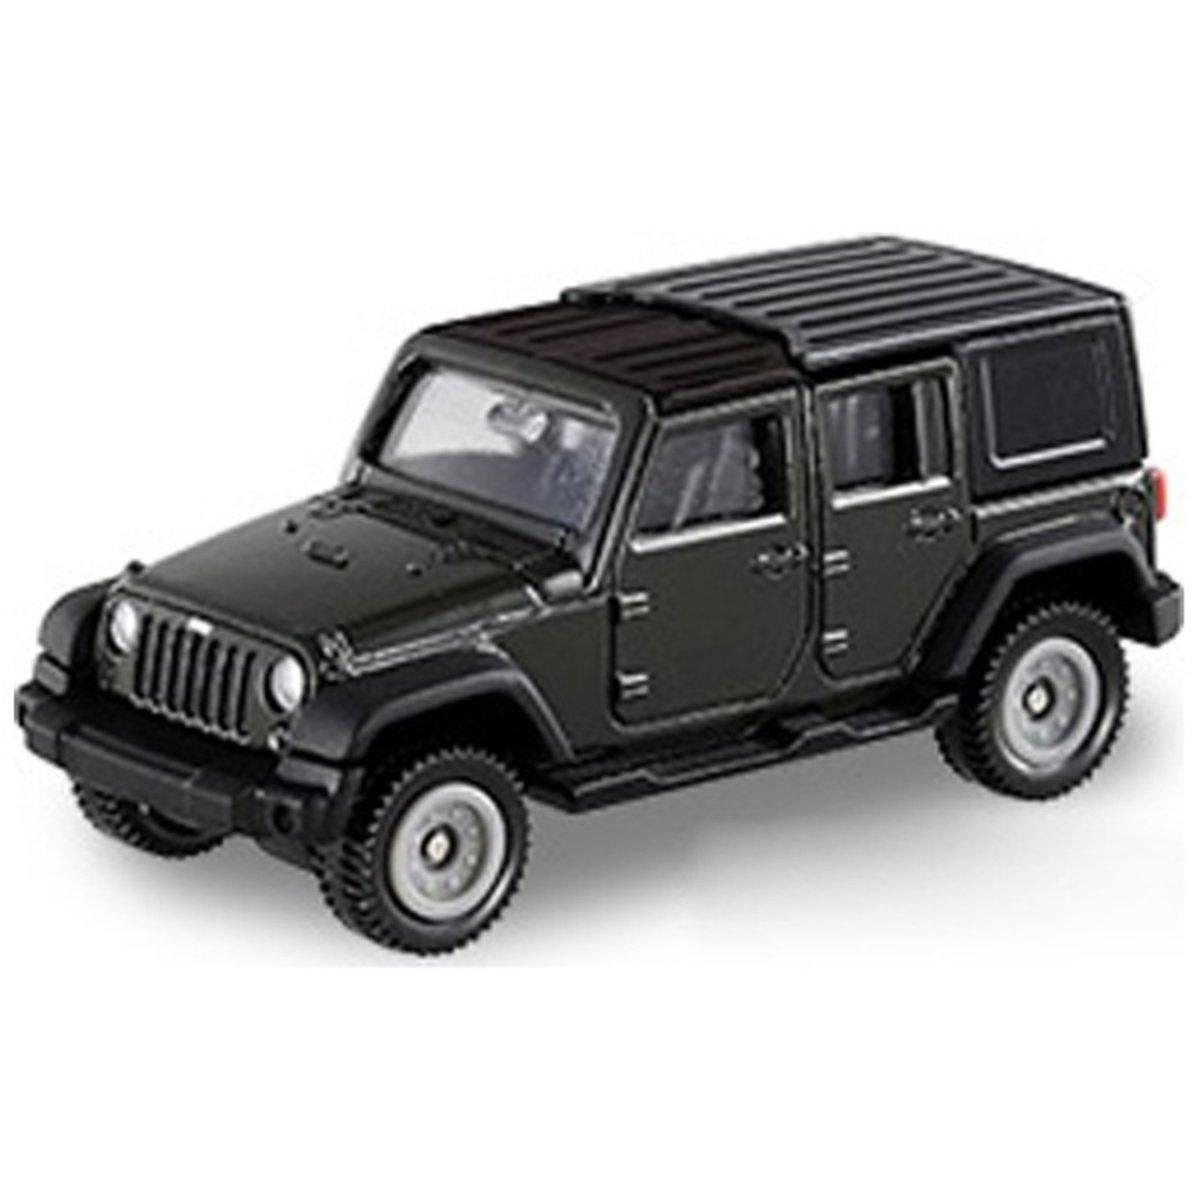 Tomy 80 Jeep Wrangler 1/65